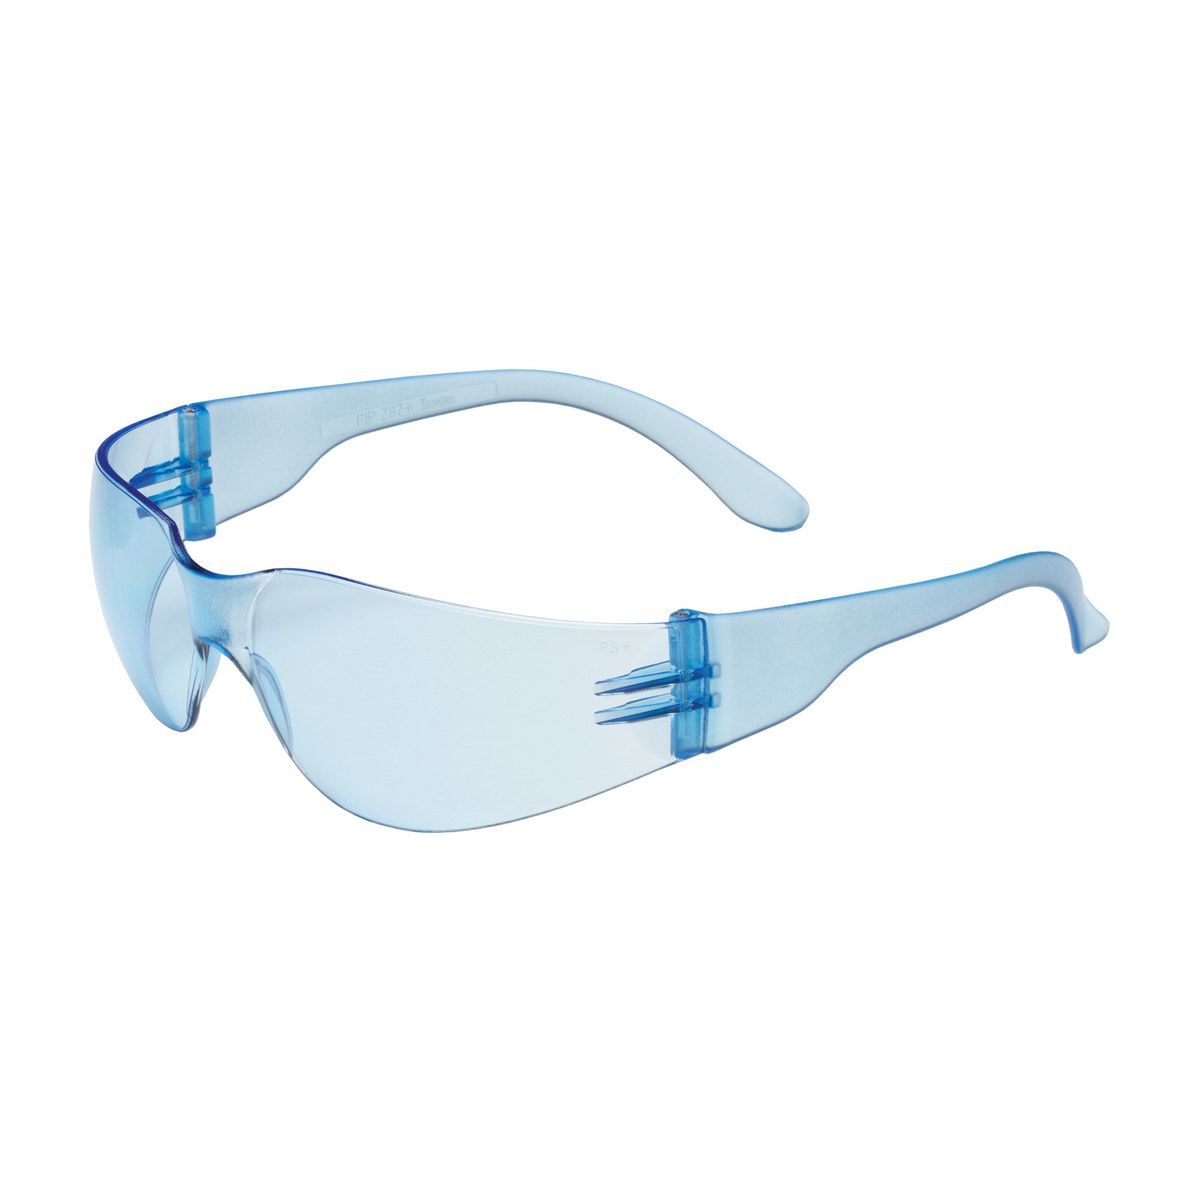 6be444b0dd Bouton Optical Zenon Z12 Universal Polycarbonate Standard Safety Glasses  Blue Lens - Dark Brown Frame - Wrap Around Frame - 616314-19999